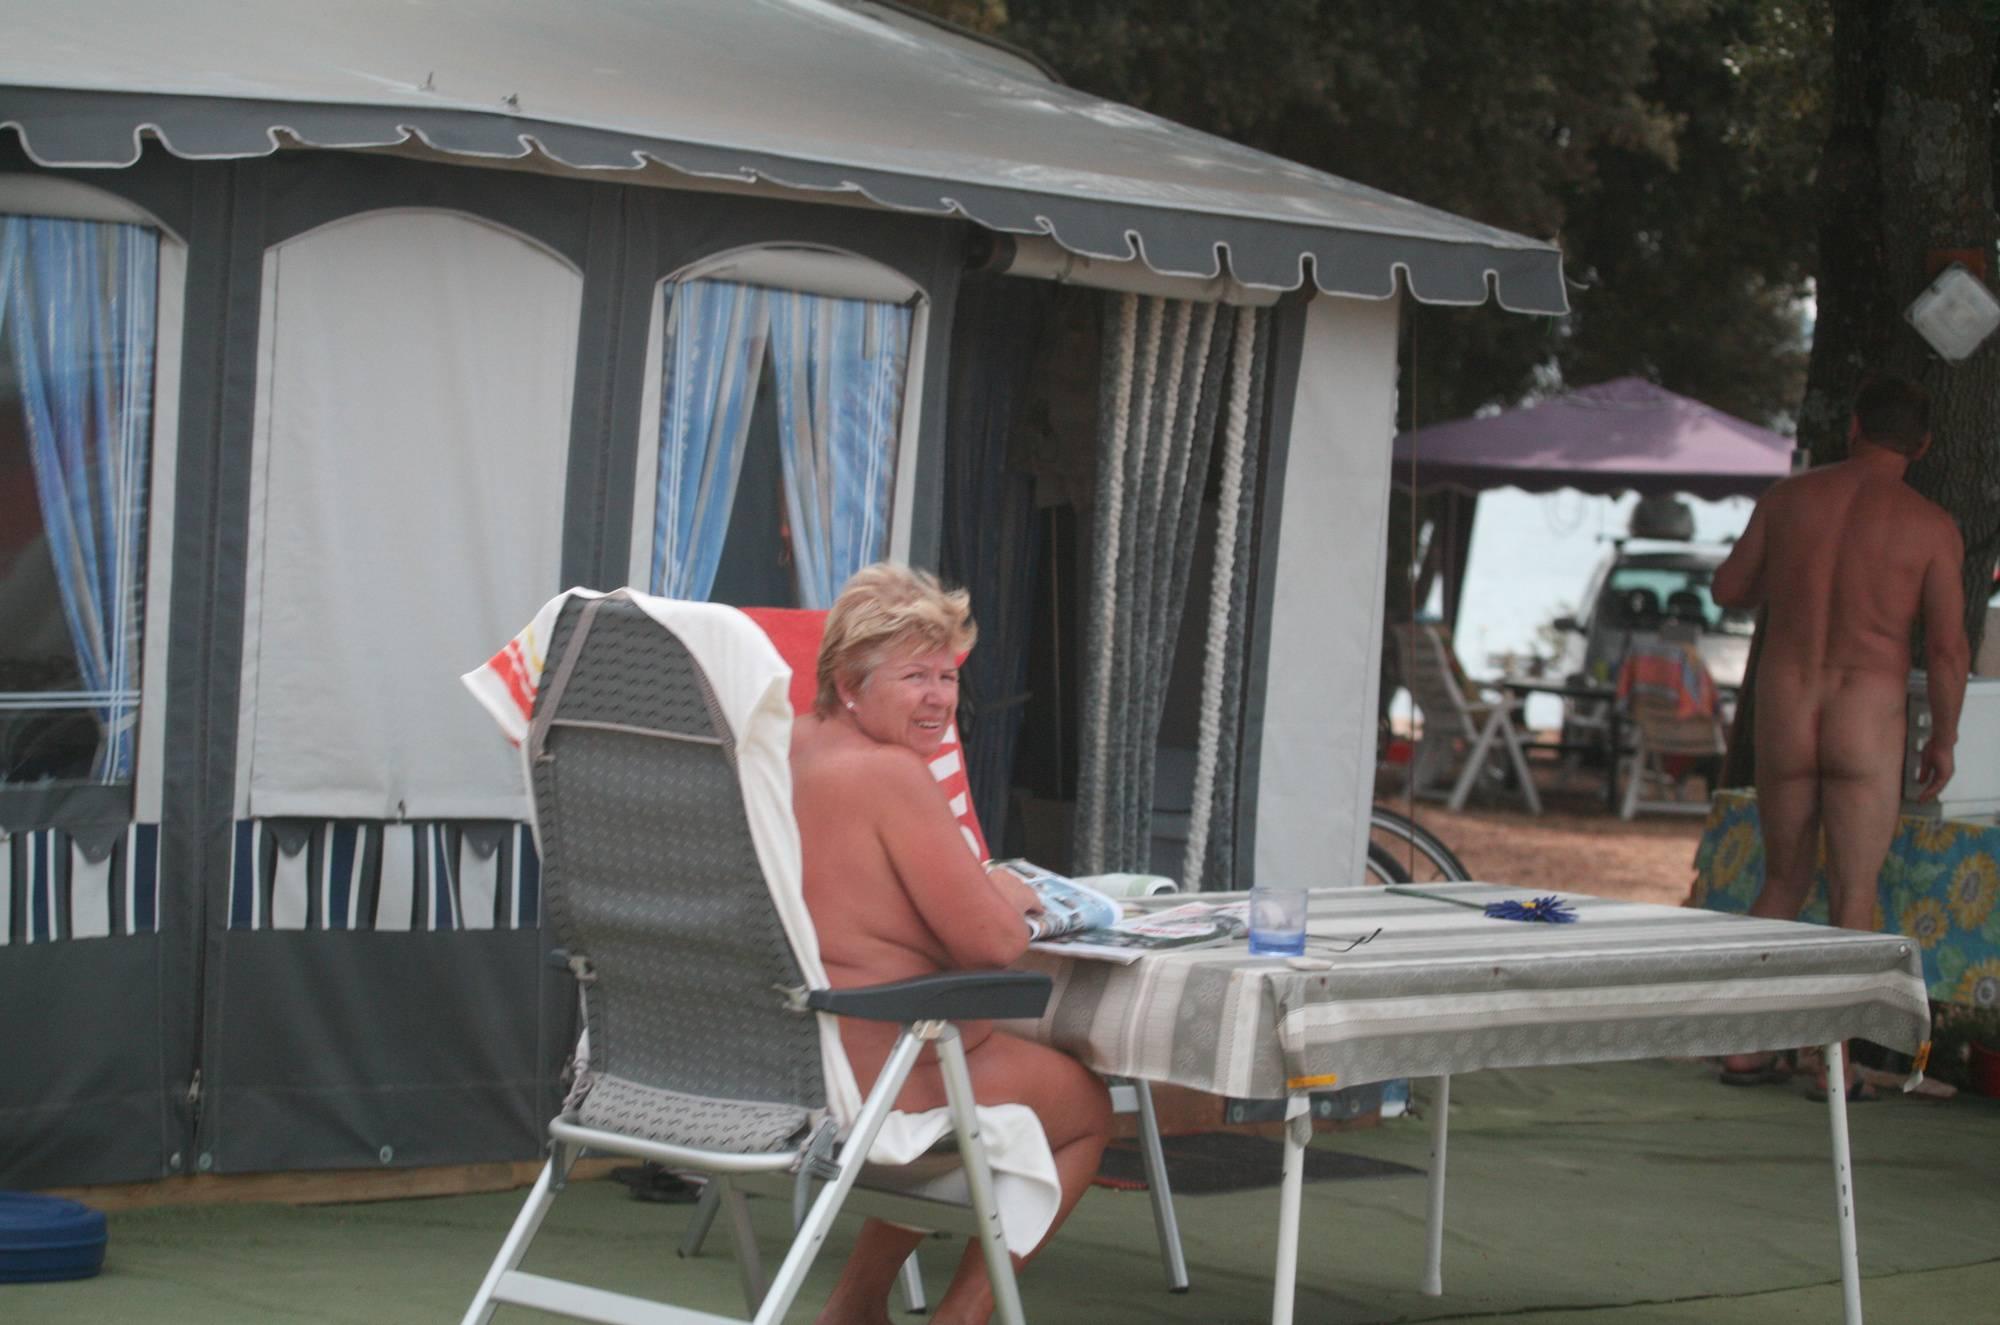 Nuda FKK Camp Locations - 3